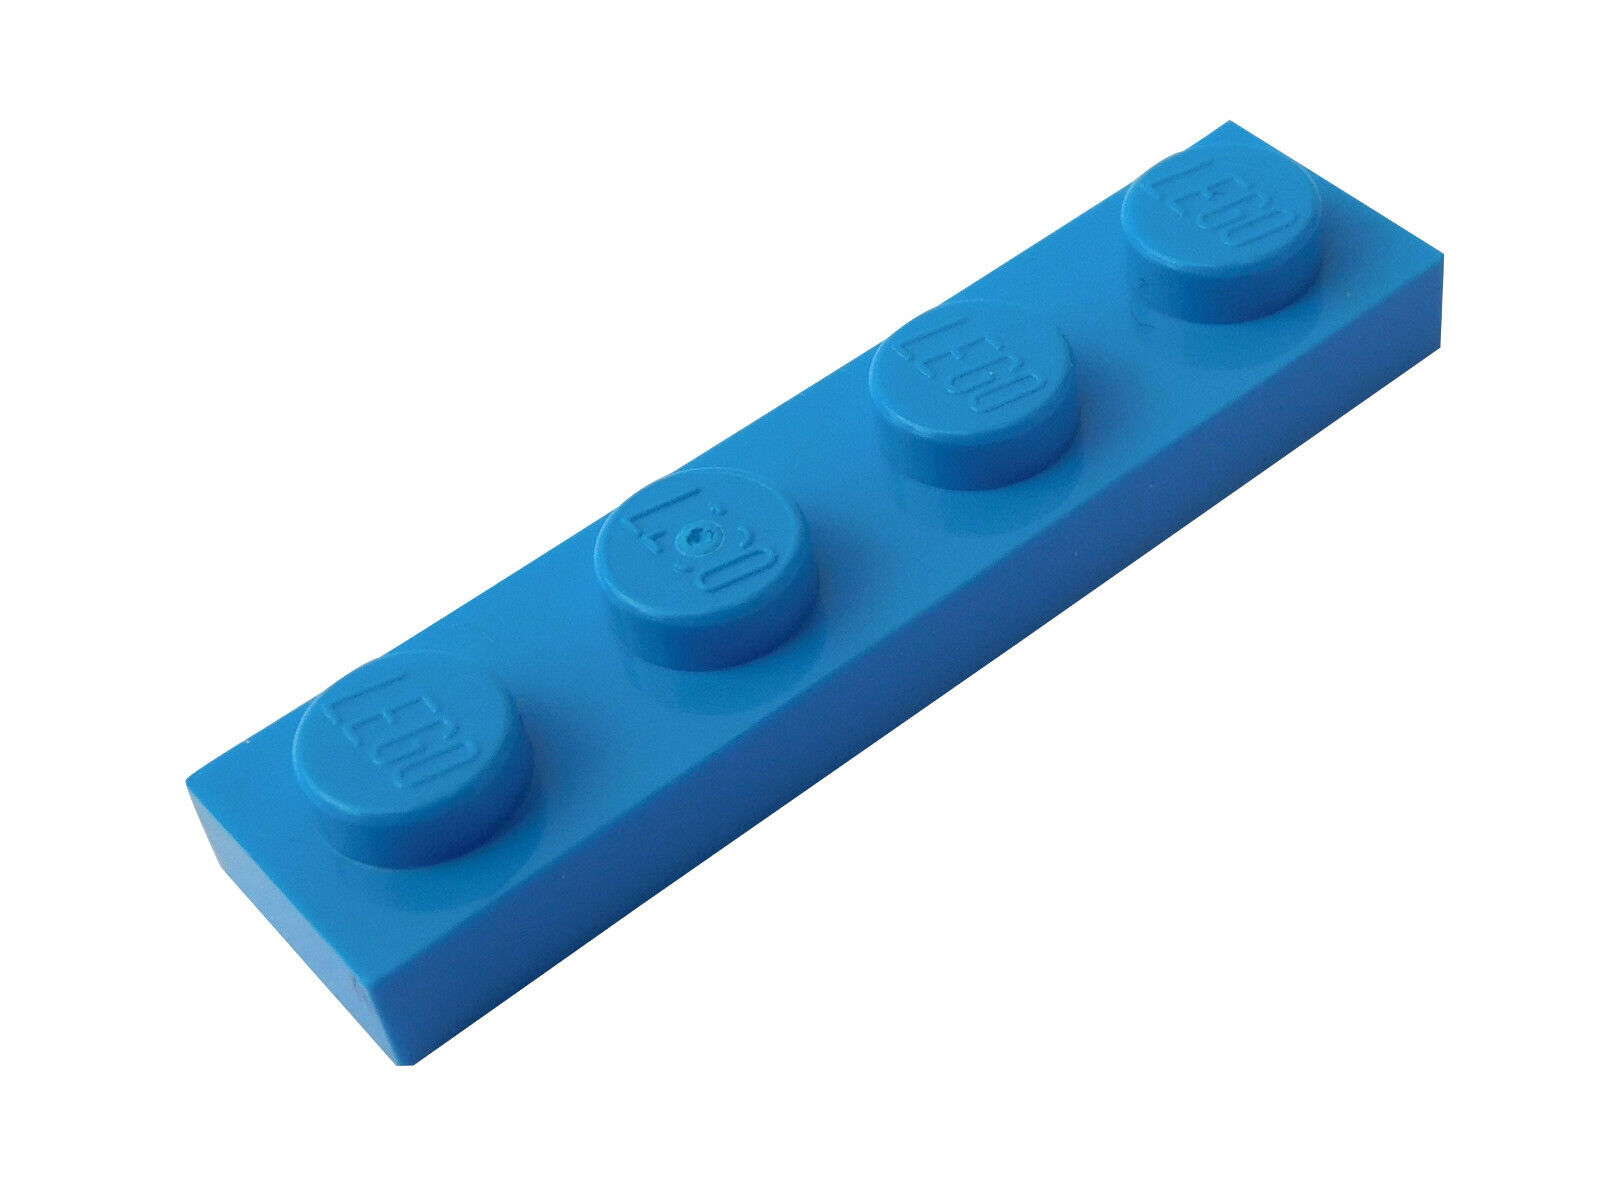 Lego 50x blaue Platte 1x1 3024 Neu Platten in blau blue plate plates new